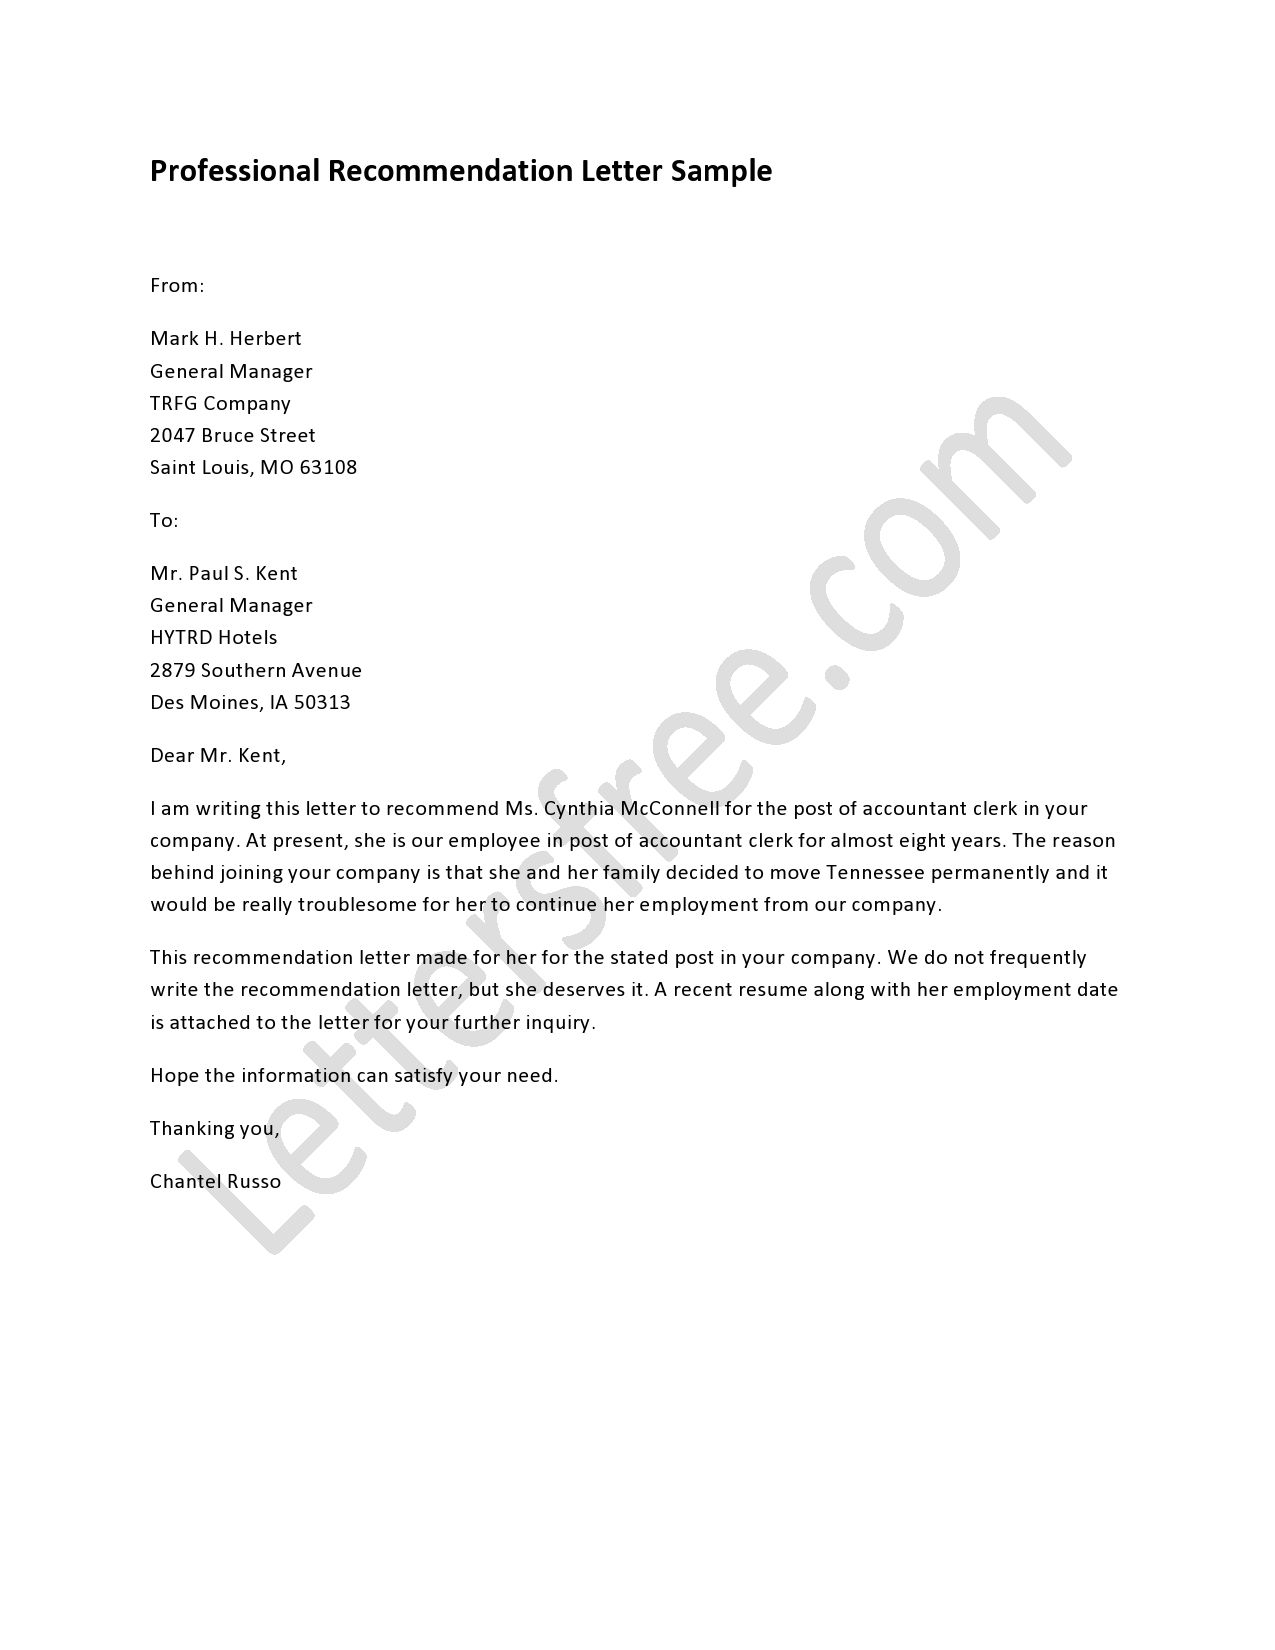 Business Referral Letter Template - Professional Re Mendation Letter Pinterest